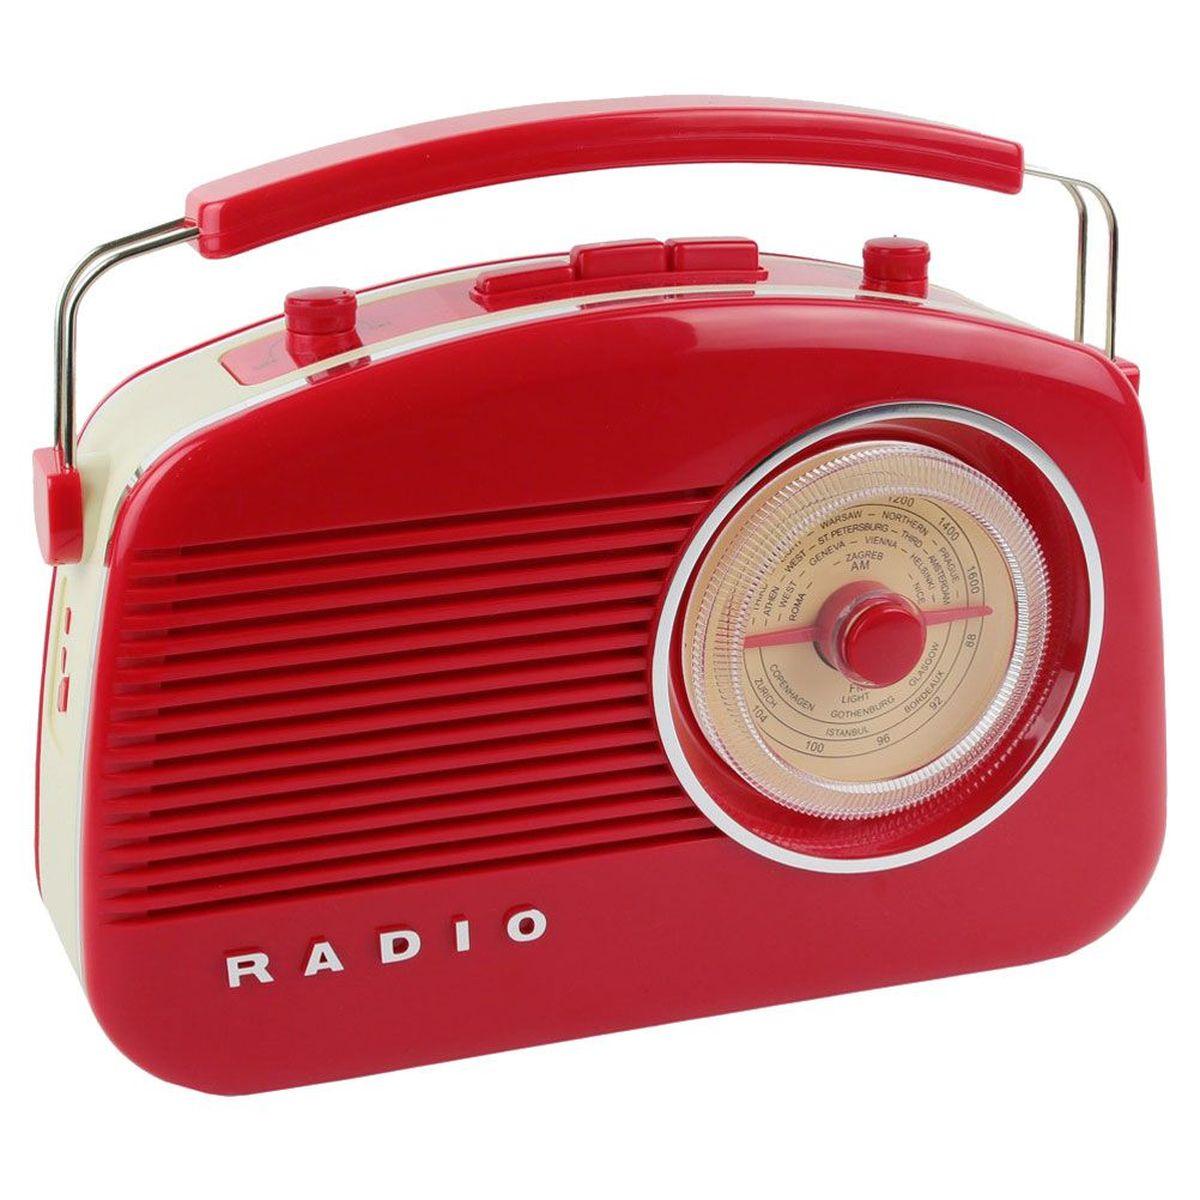 radio rouge vintage r tro 60 39 s fonction bluetooth. Black Bedroom Furniture Sets. Home Design Ideas